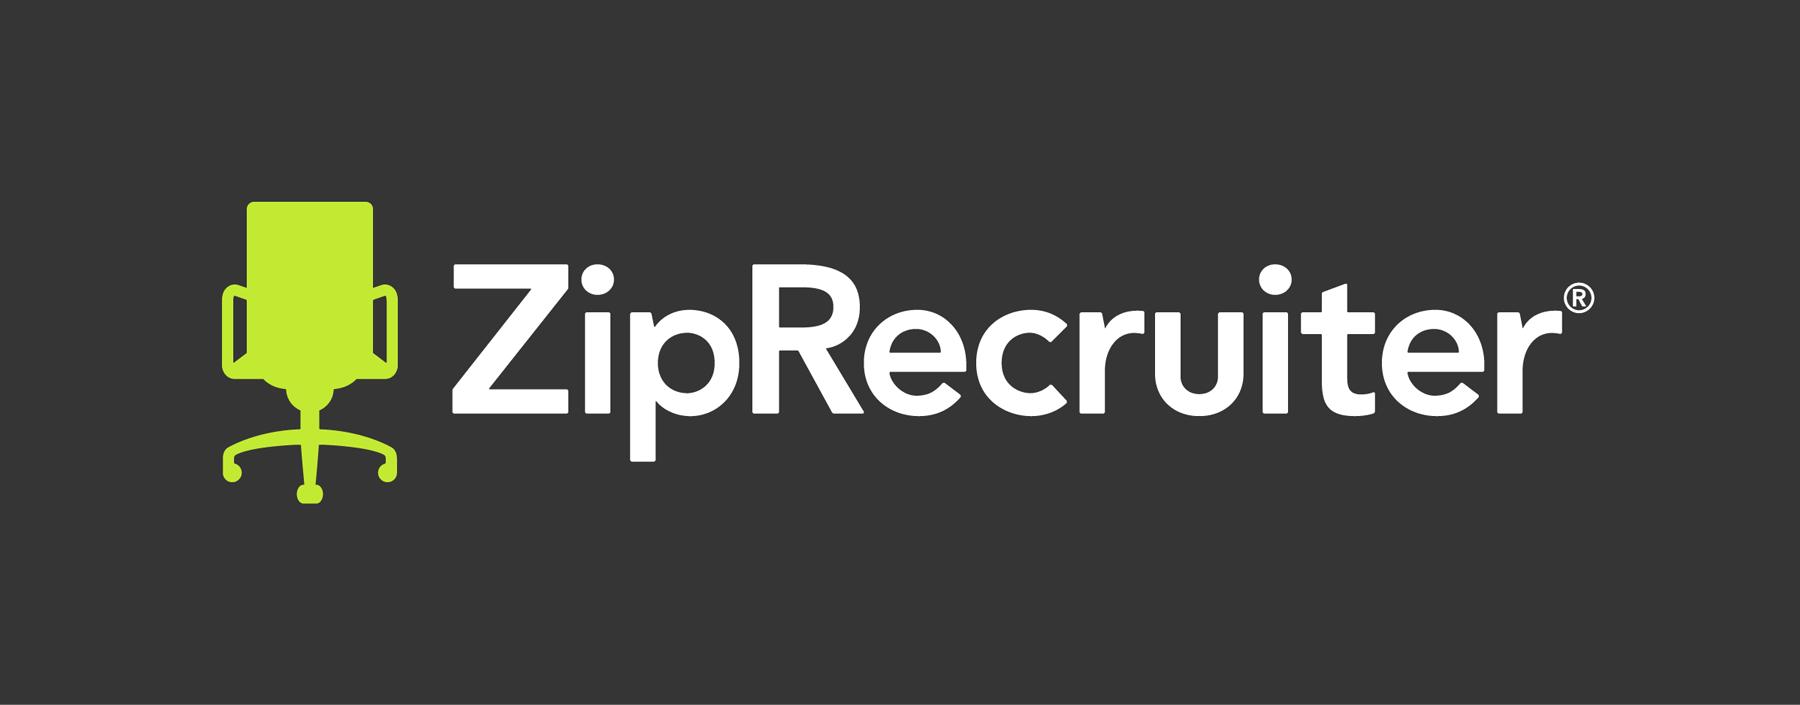 ziprecruiter hire freelance journalists